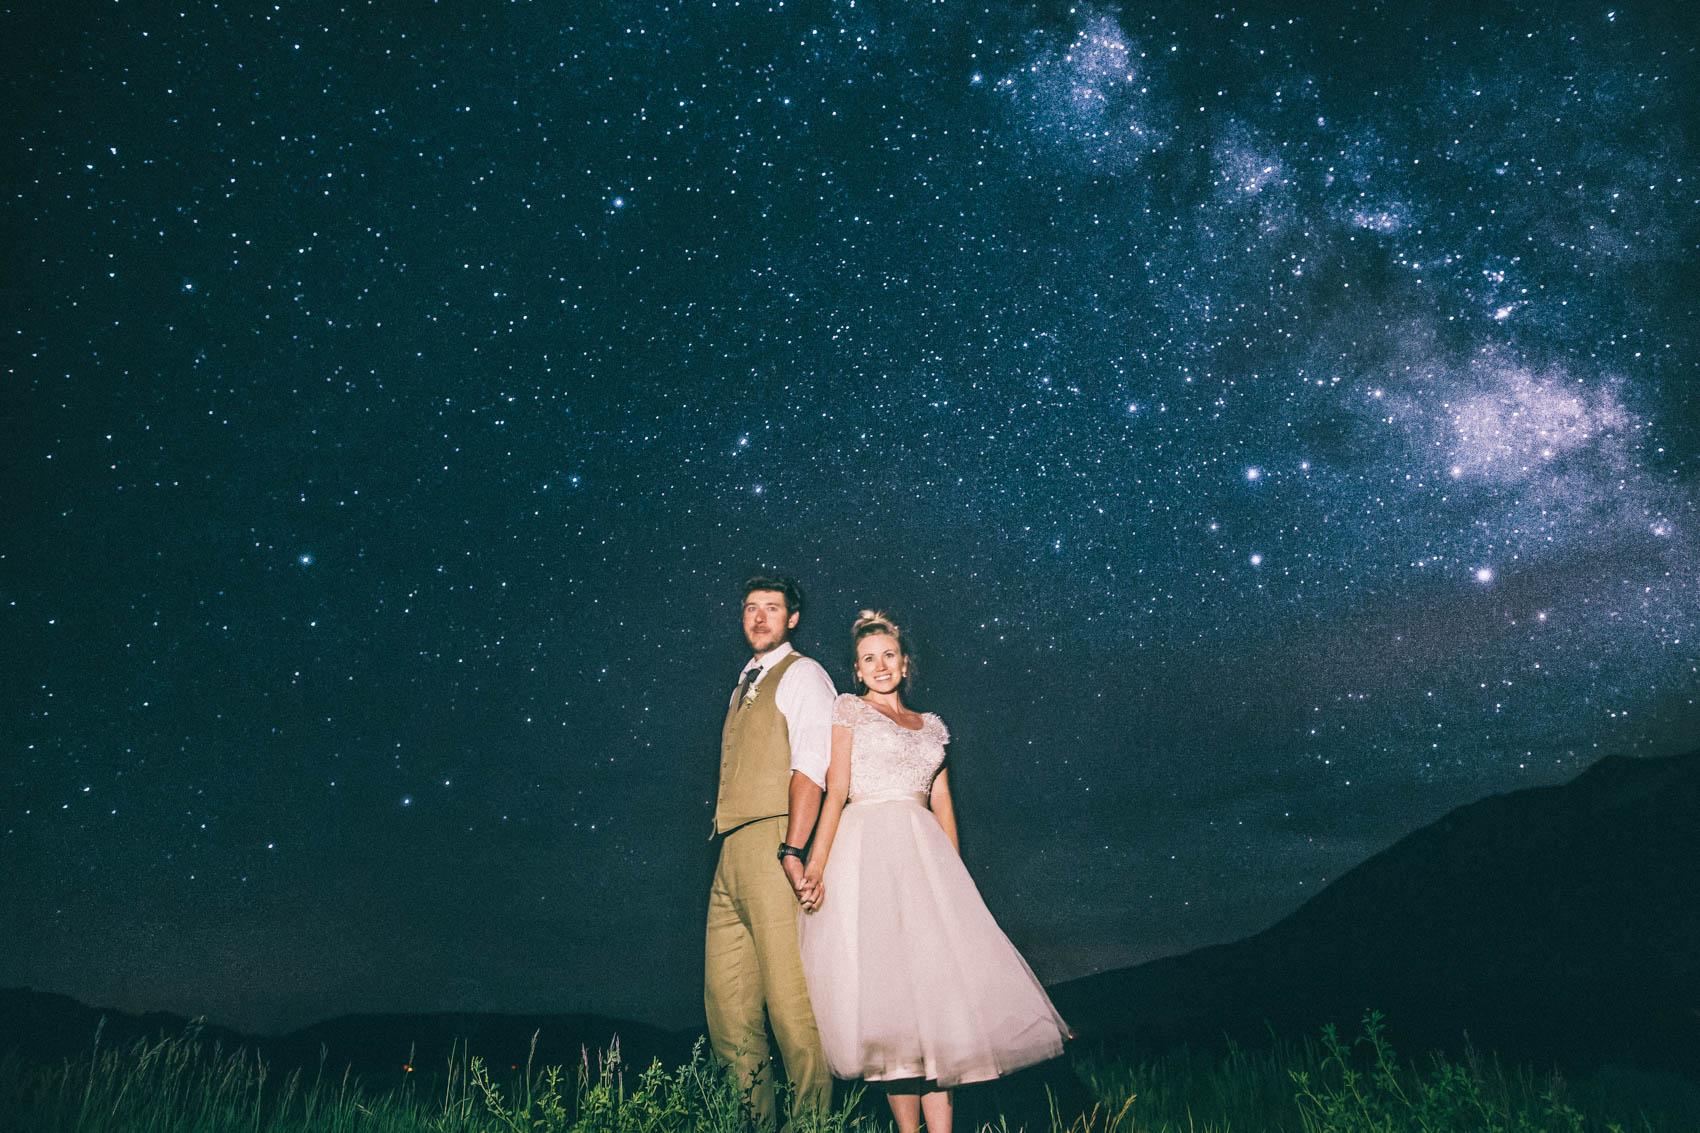 060_Crested Butte Wedding Photographer Secret Stash Woods Walk Ceremony Jamie Blue Bird Events Boho Epic Stars